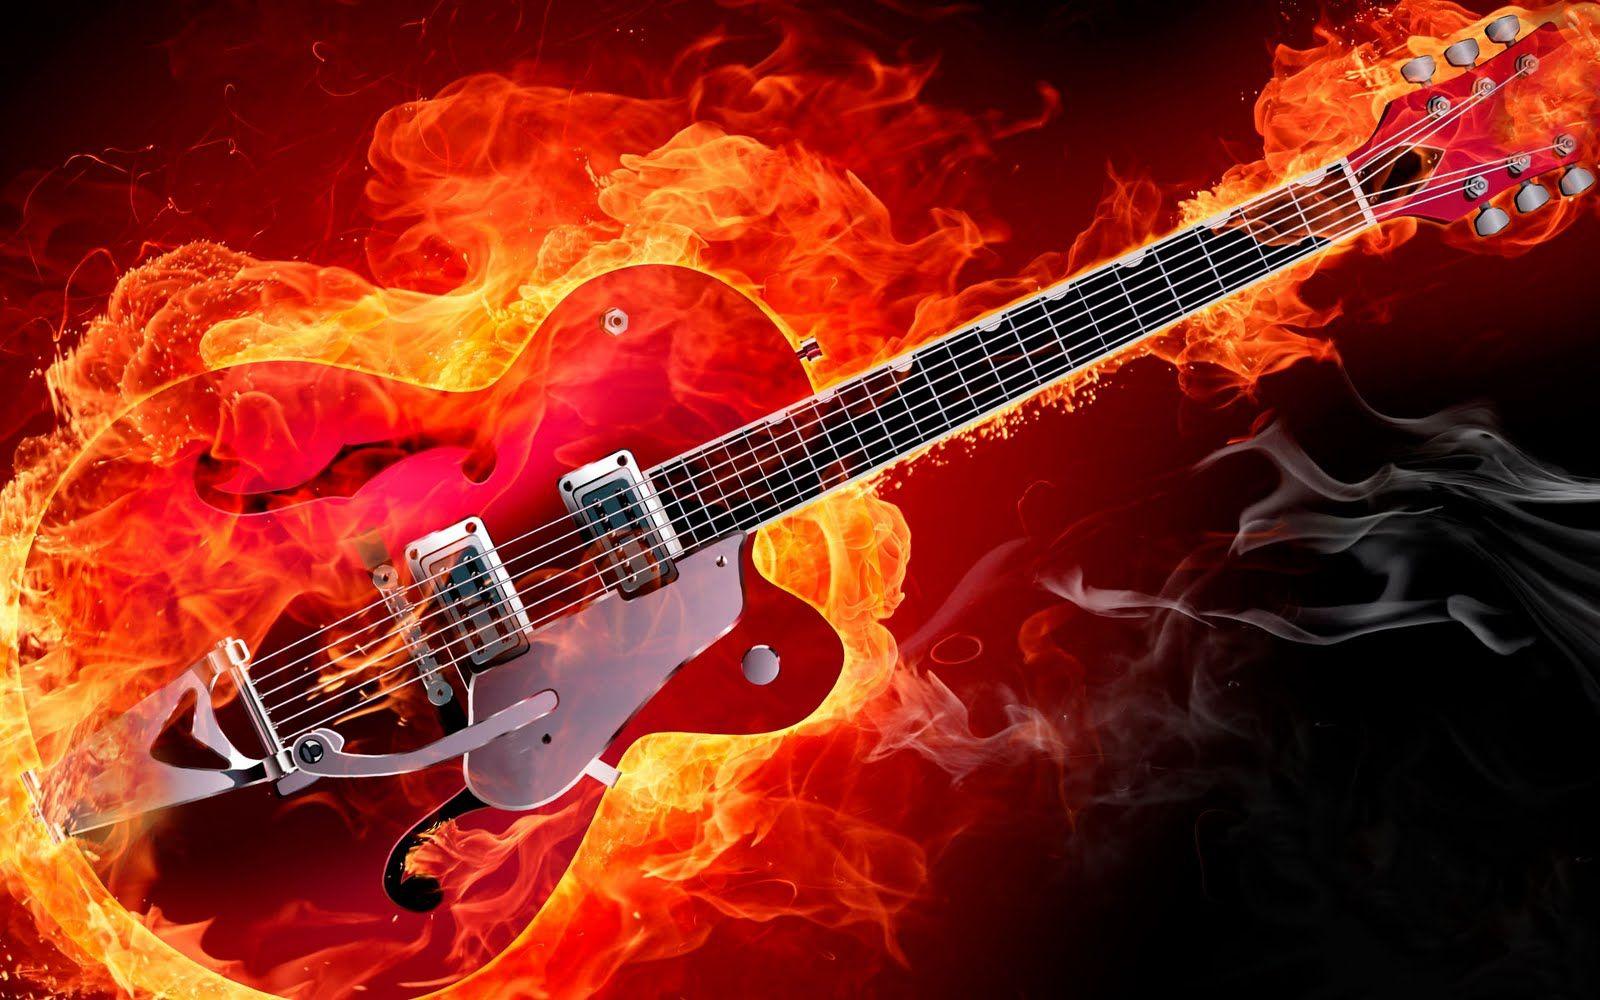 Cool Guitar Desktop Wallpapers Wallpaper Cave